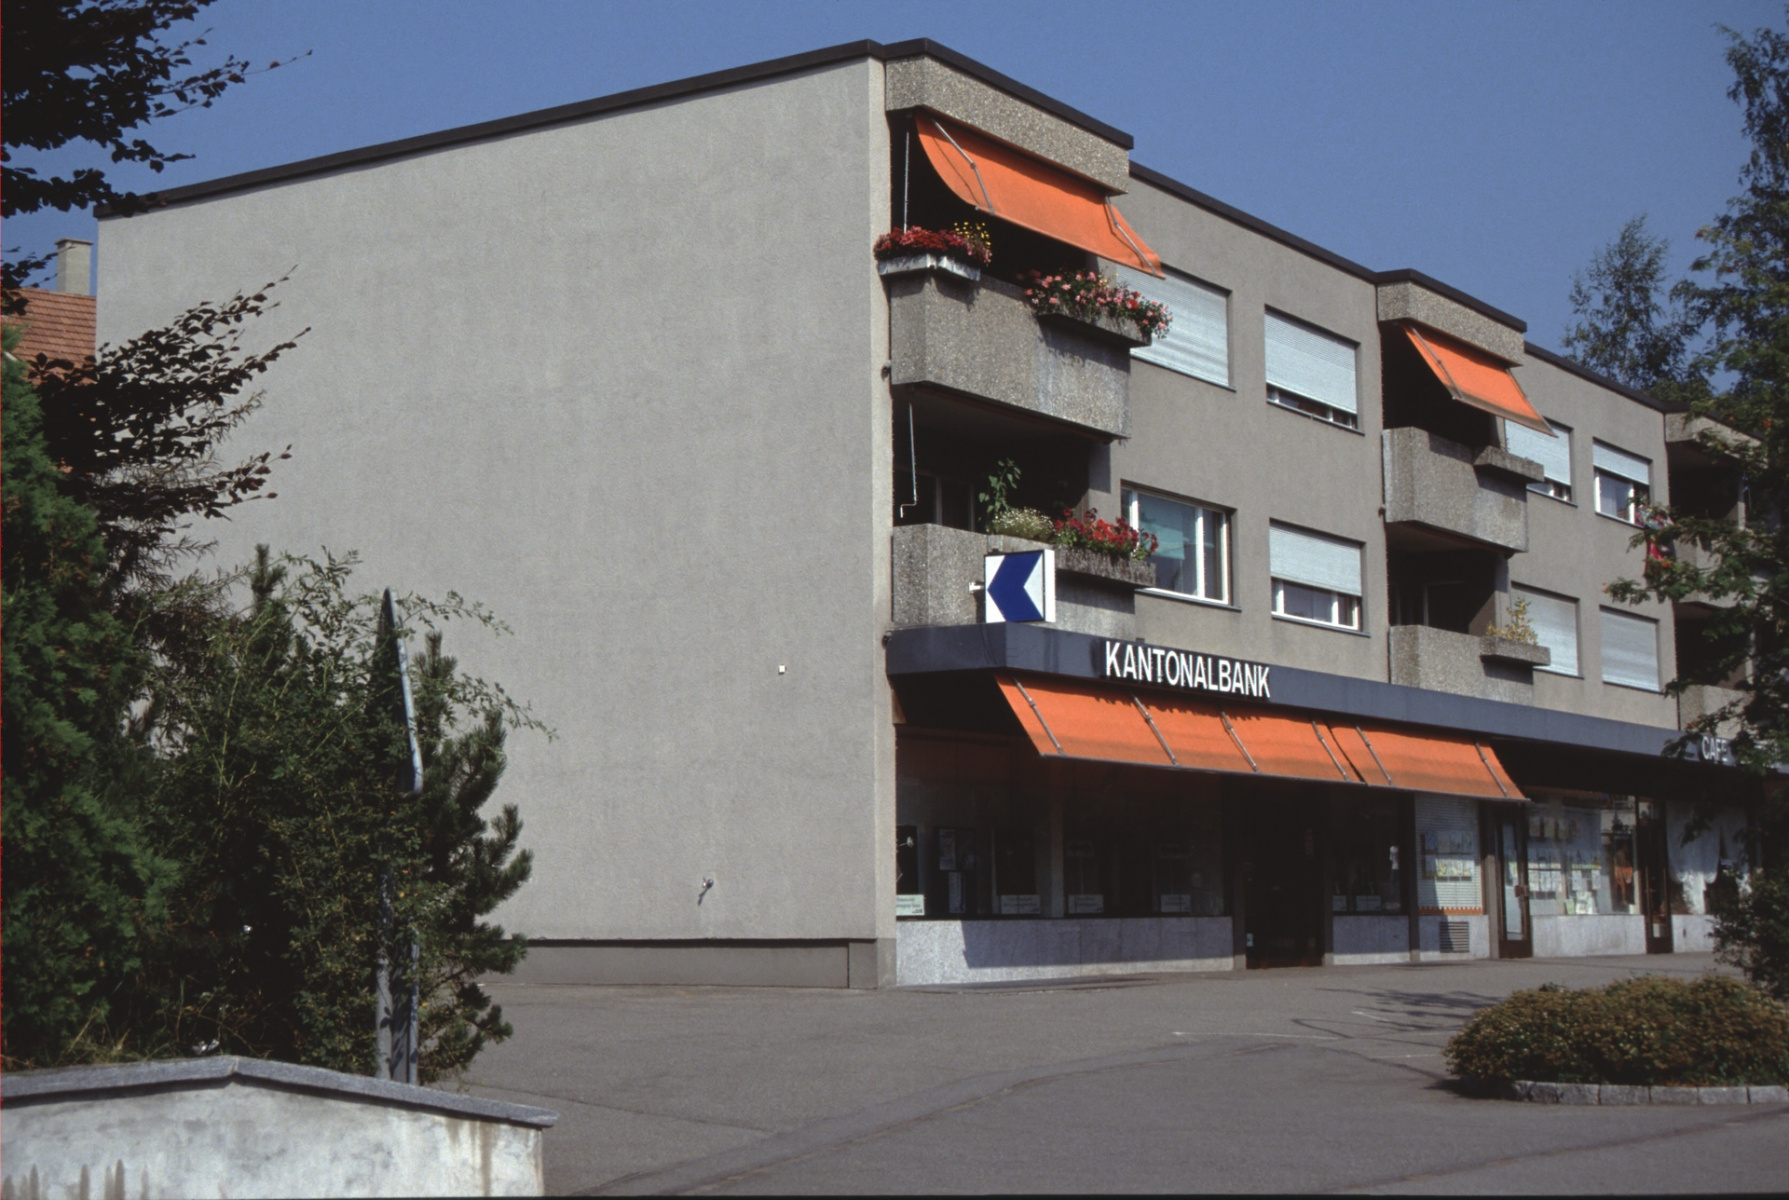 Bahnhofstr 16, Kantonalbank (Längsansicht)